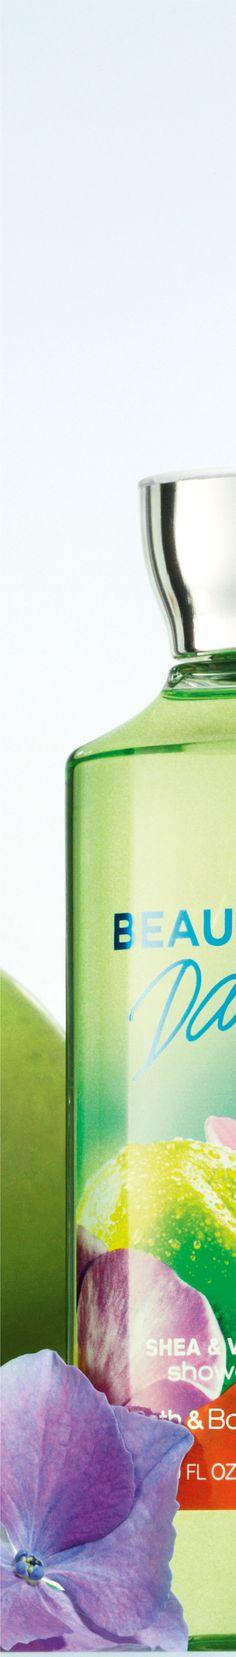 #BeautifulDay fragranc fan, milan darlin, bodi work